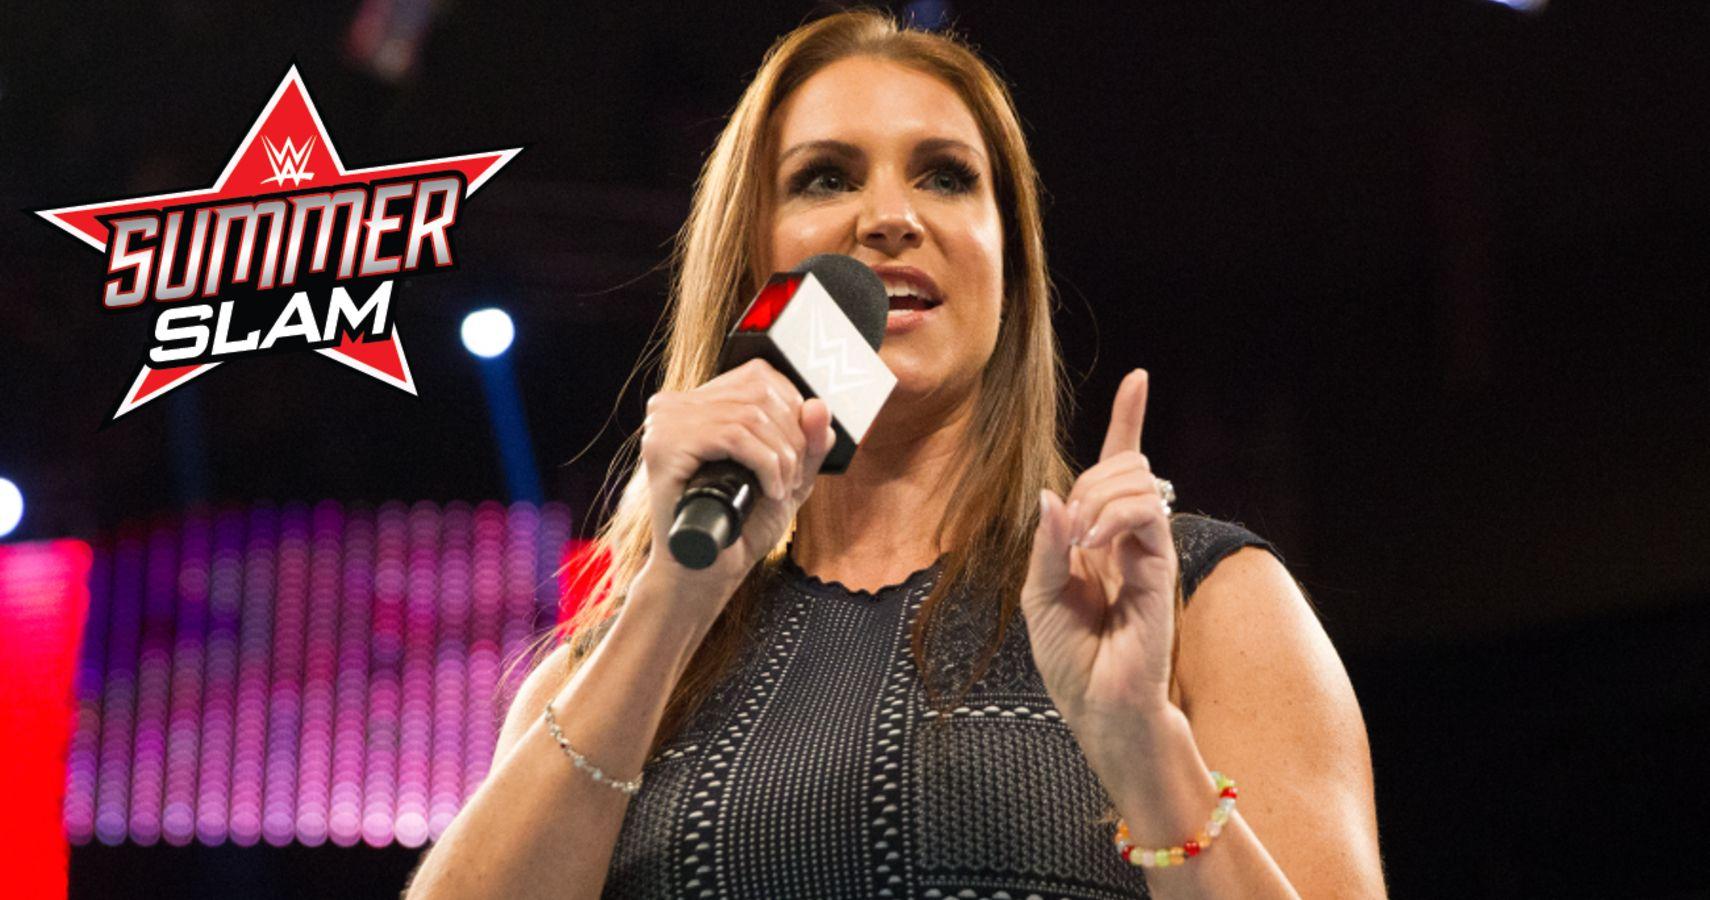 Stephanie McMahon Promises Surprises For SummerSlam